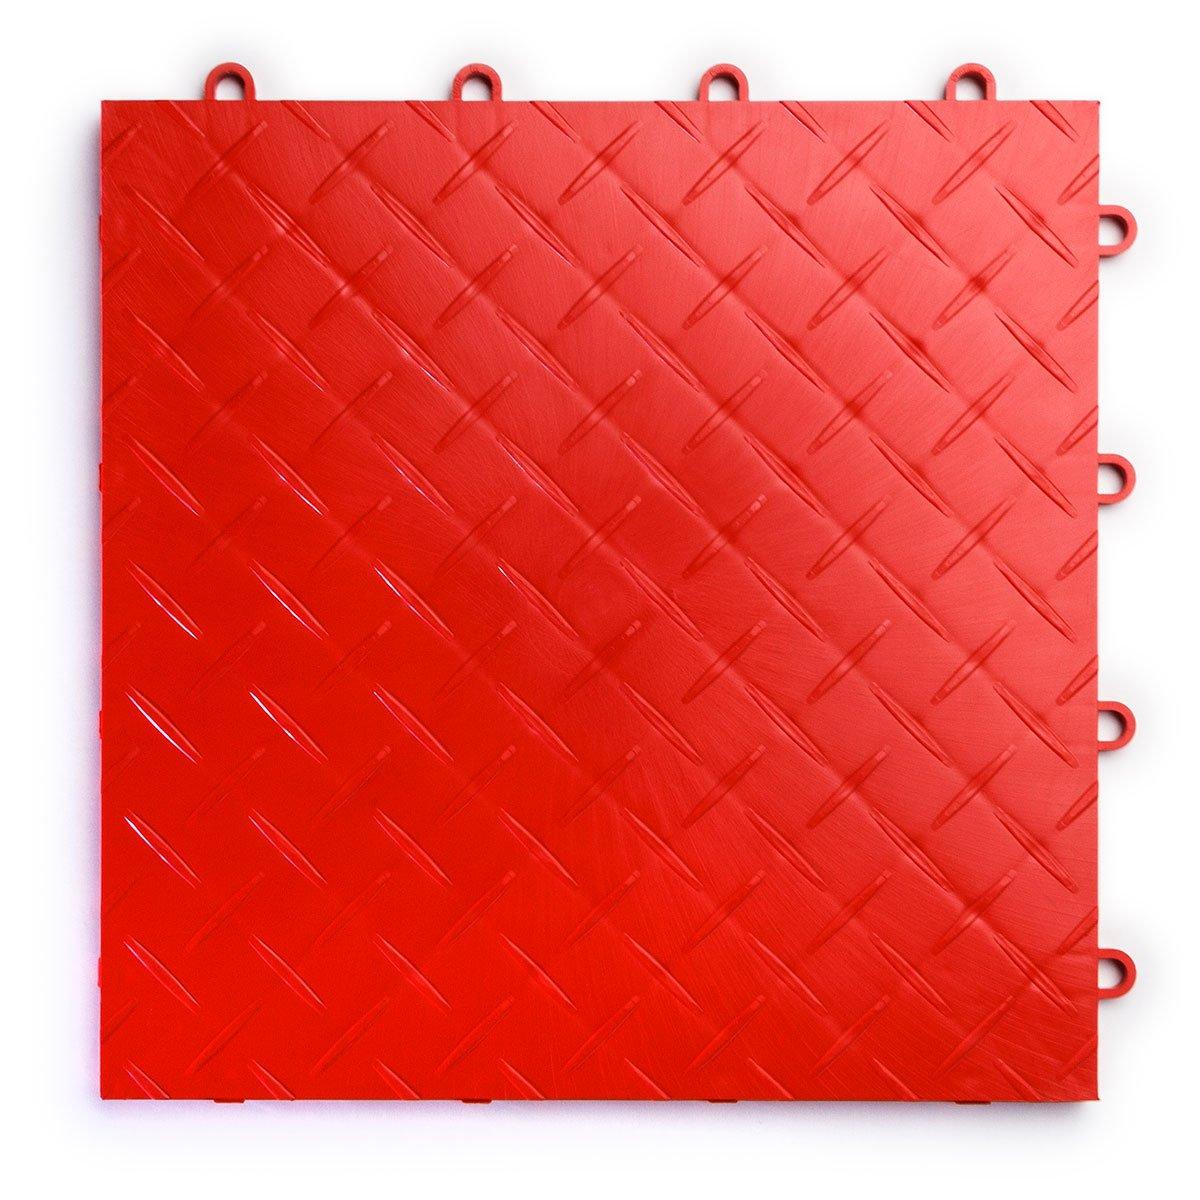 RaceDeck RD48BRED Diamond Plate Interlocking Modular Garage Flooring Tiles Durable, 48 Pack, Red, Piece